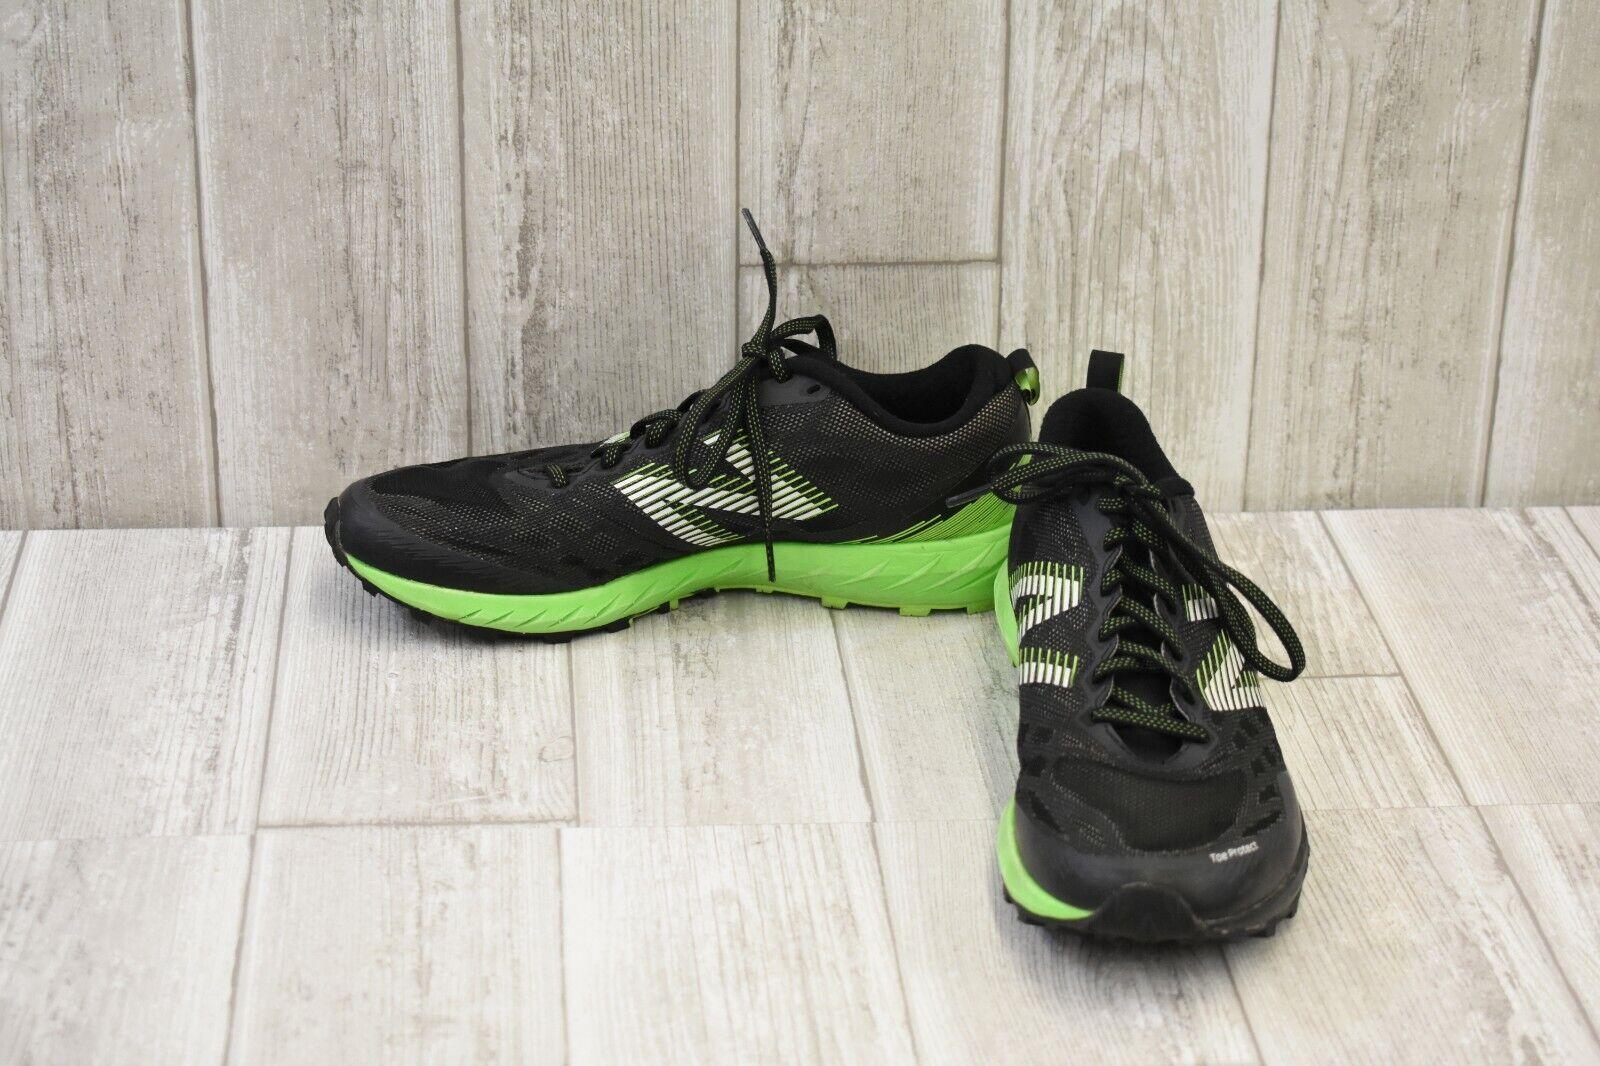 New Balance MTUNKNB Sneaker - Men's Size 8D Black Green